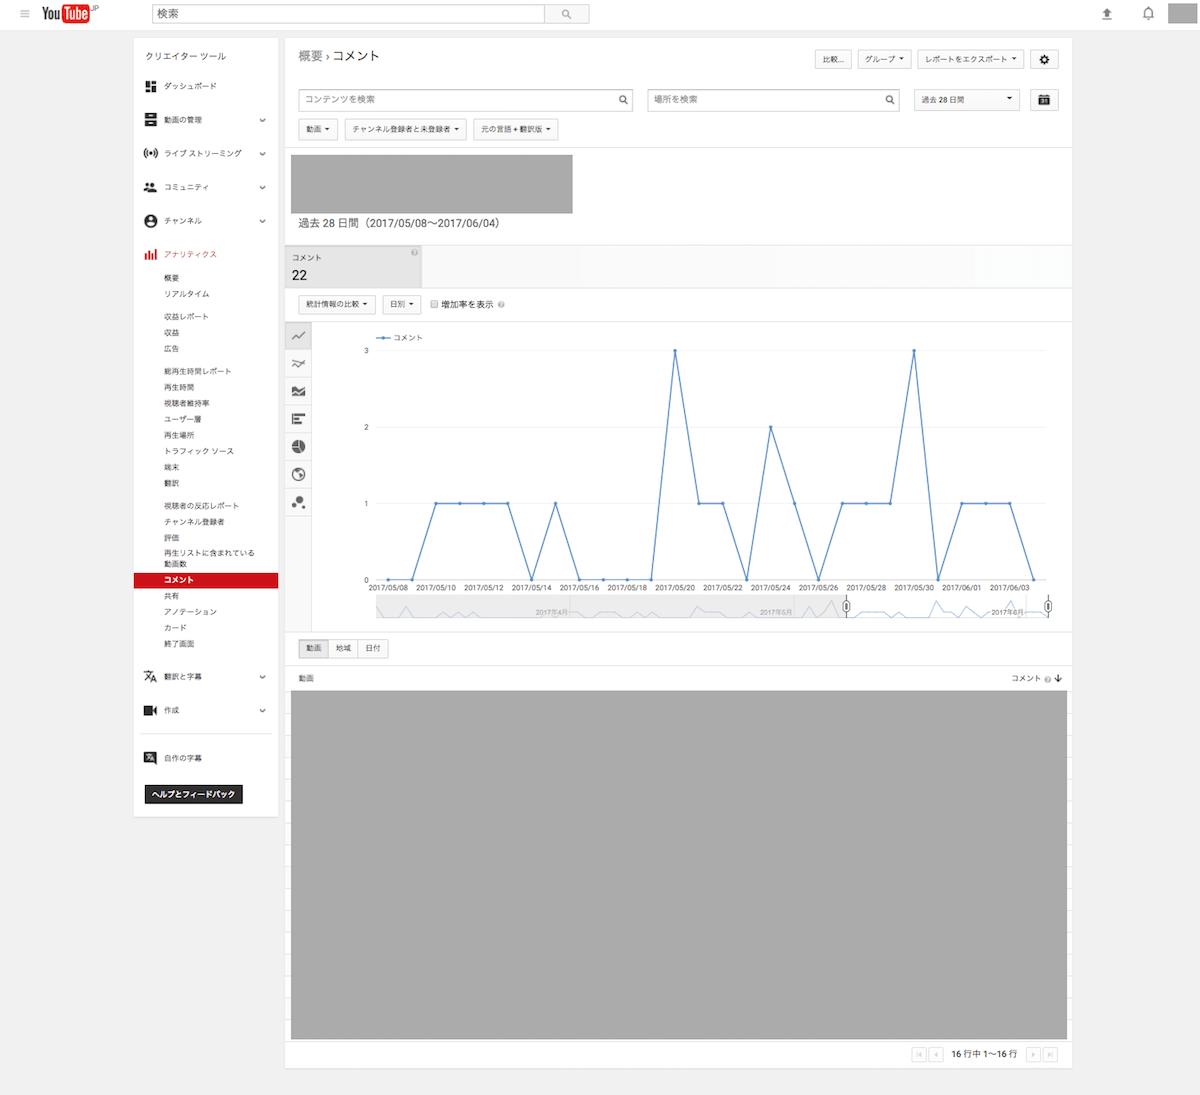 YA11 min YouTubeアナリティクスの使い方【初心者でもわかる!】